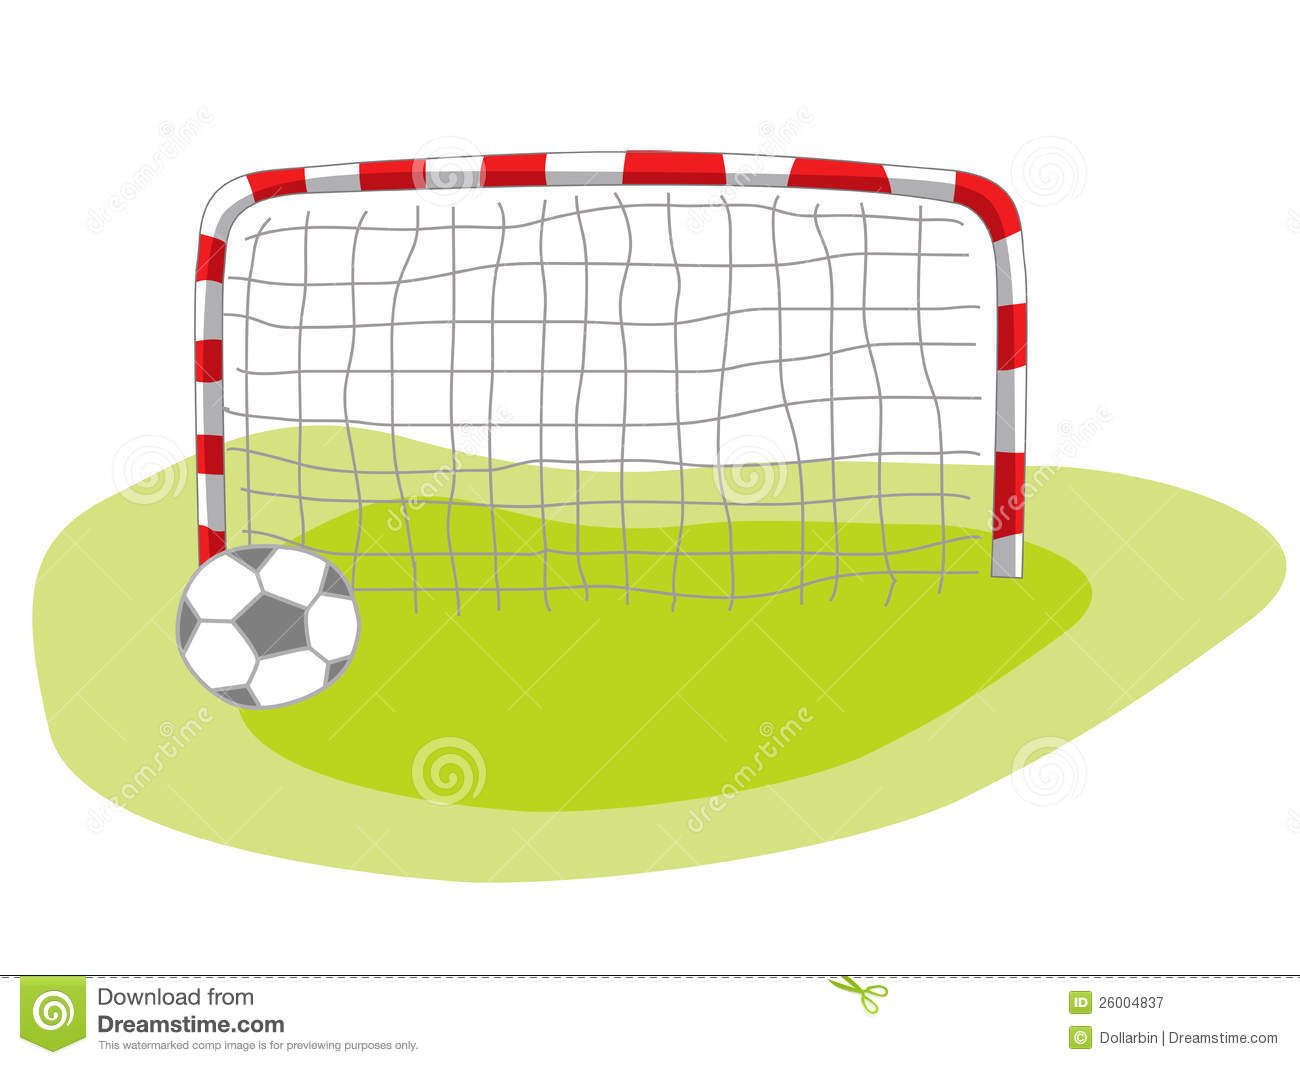 score-a-goal-clipart-h...